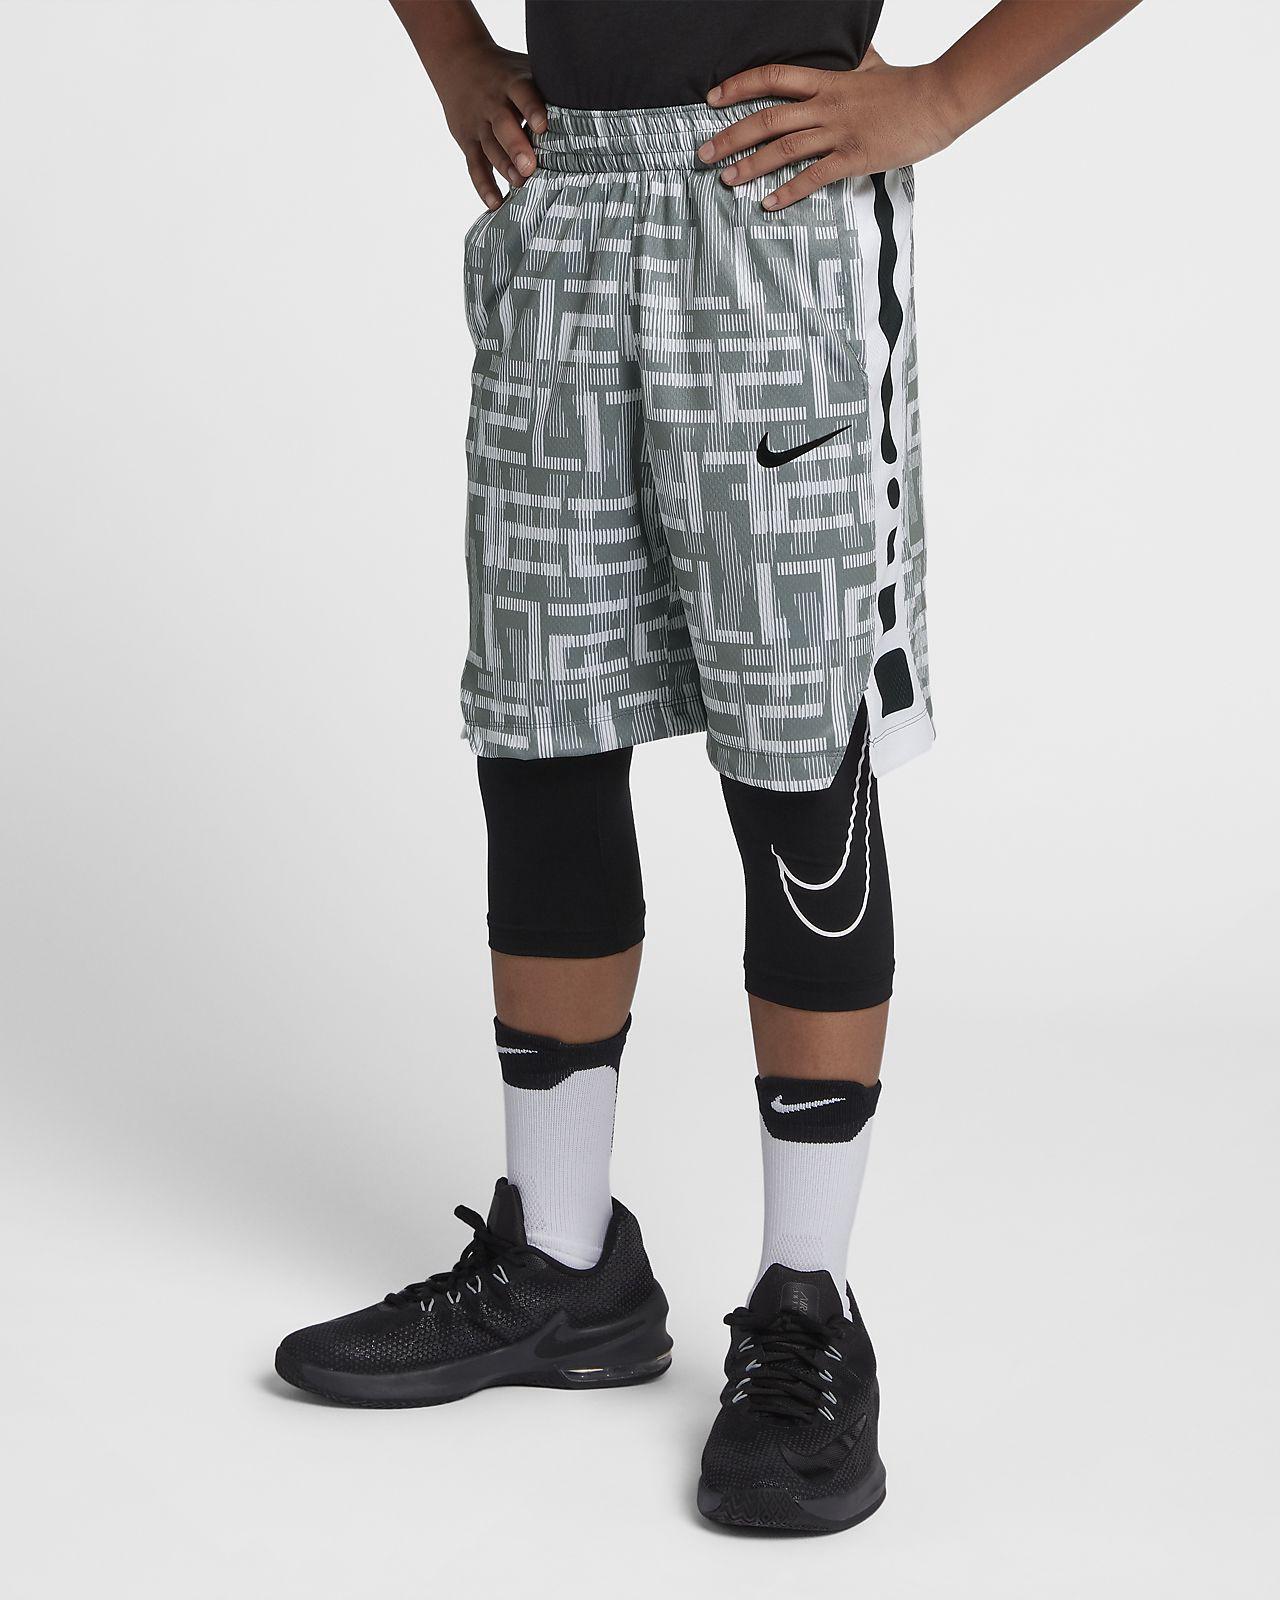 a81f64446904 Nike Elite Big Kids  (Boys ) Printed Basketball Shorts - M (10-12 ...